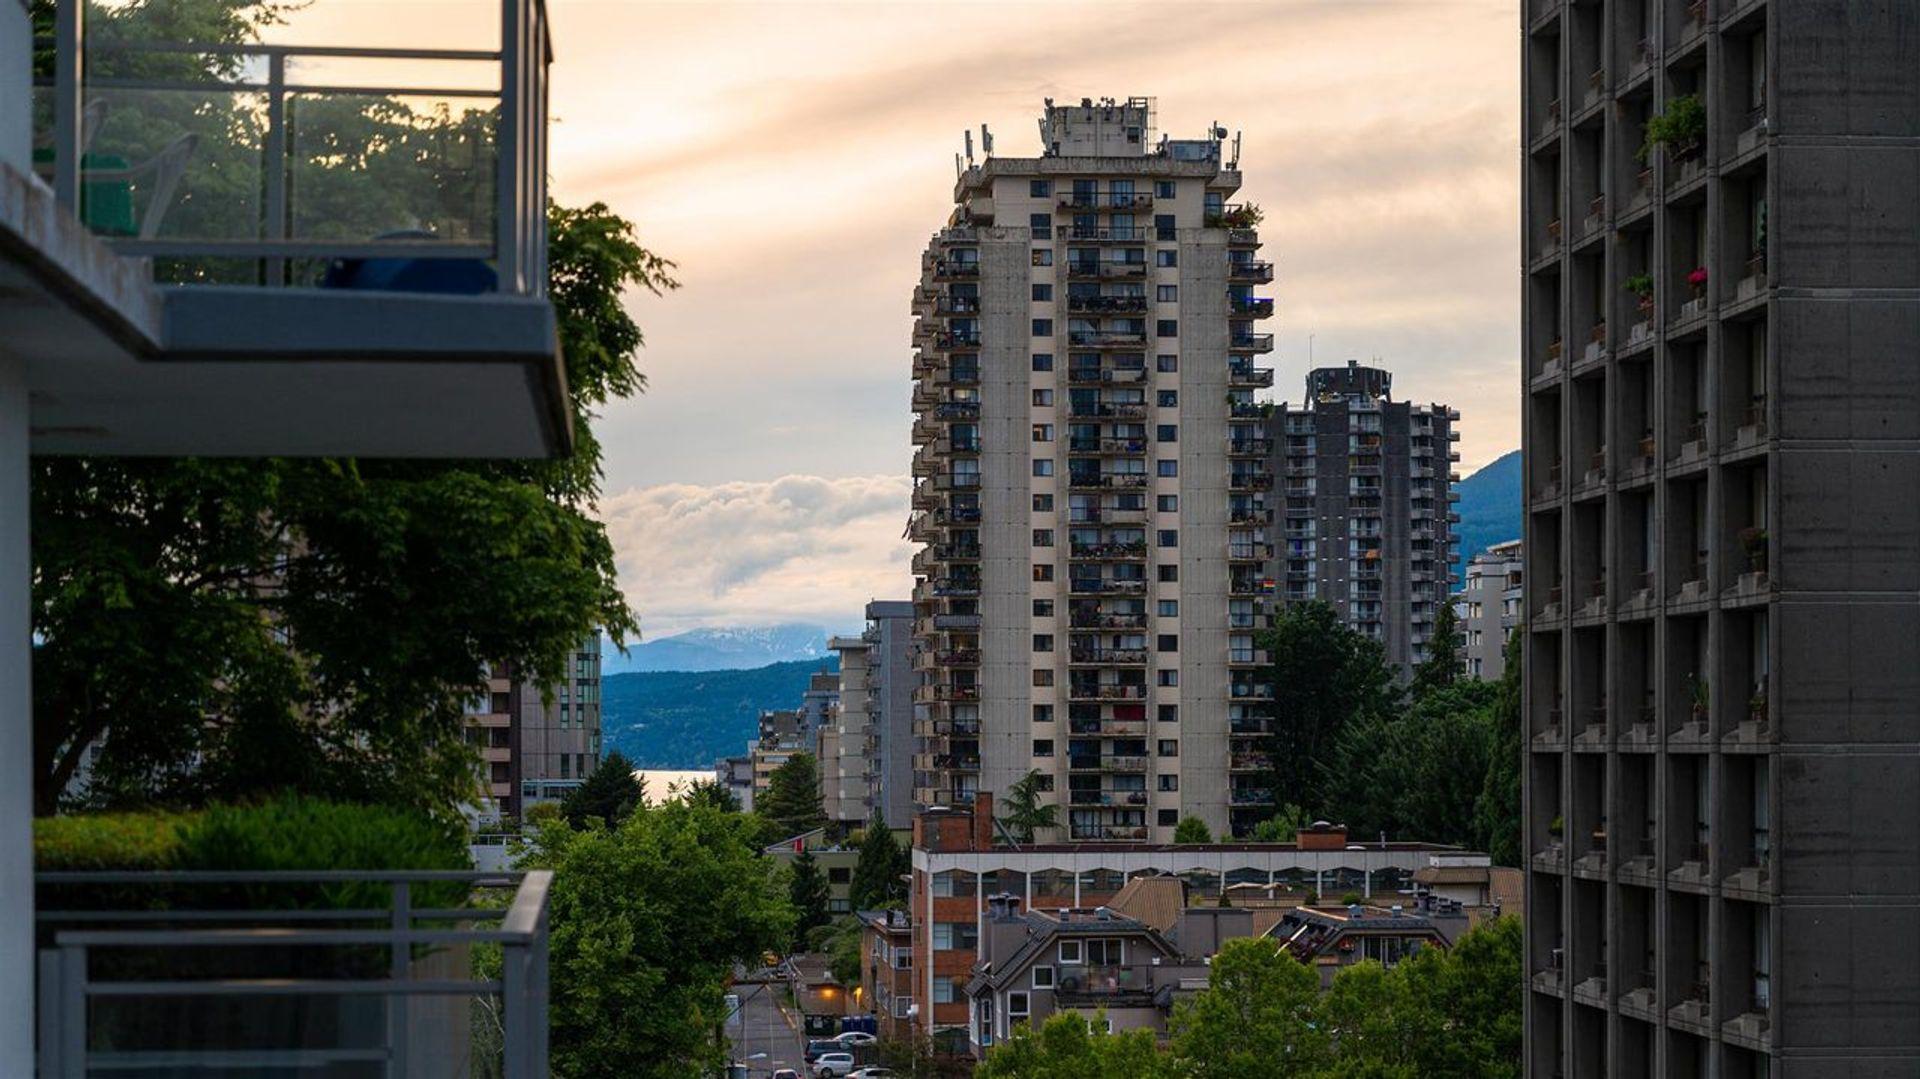 1009-harwood-street-west-end-vw-vancouver-west-18 at 1003 - 1009 Harwood Street, West End VW, Vancouver West